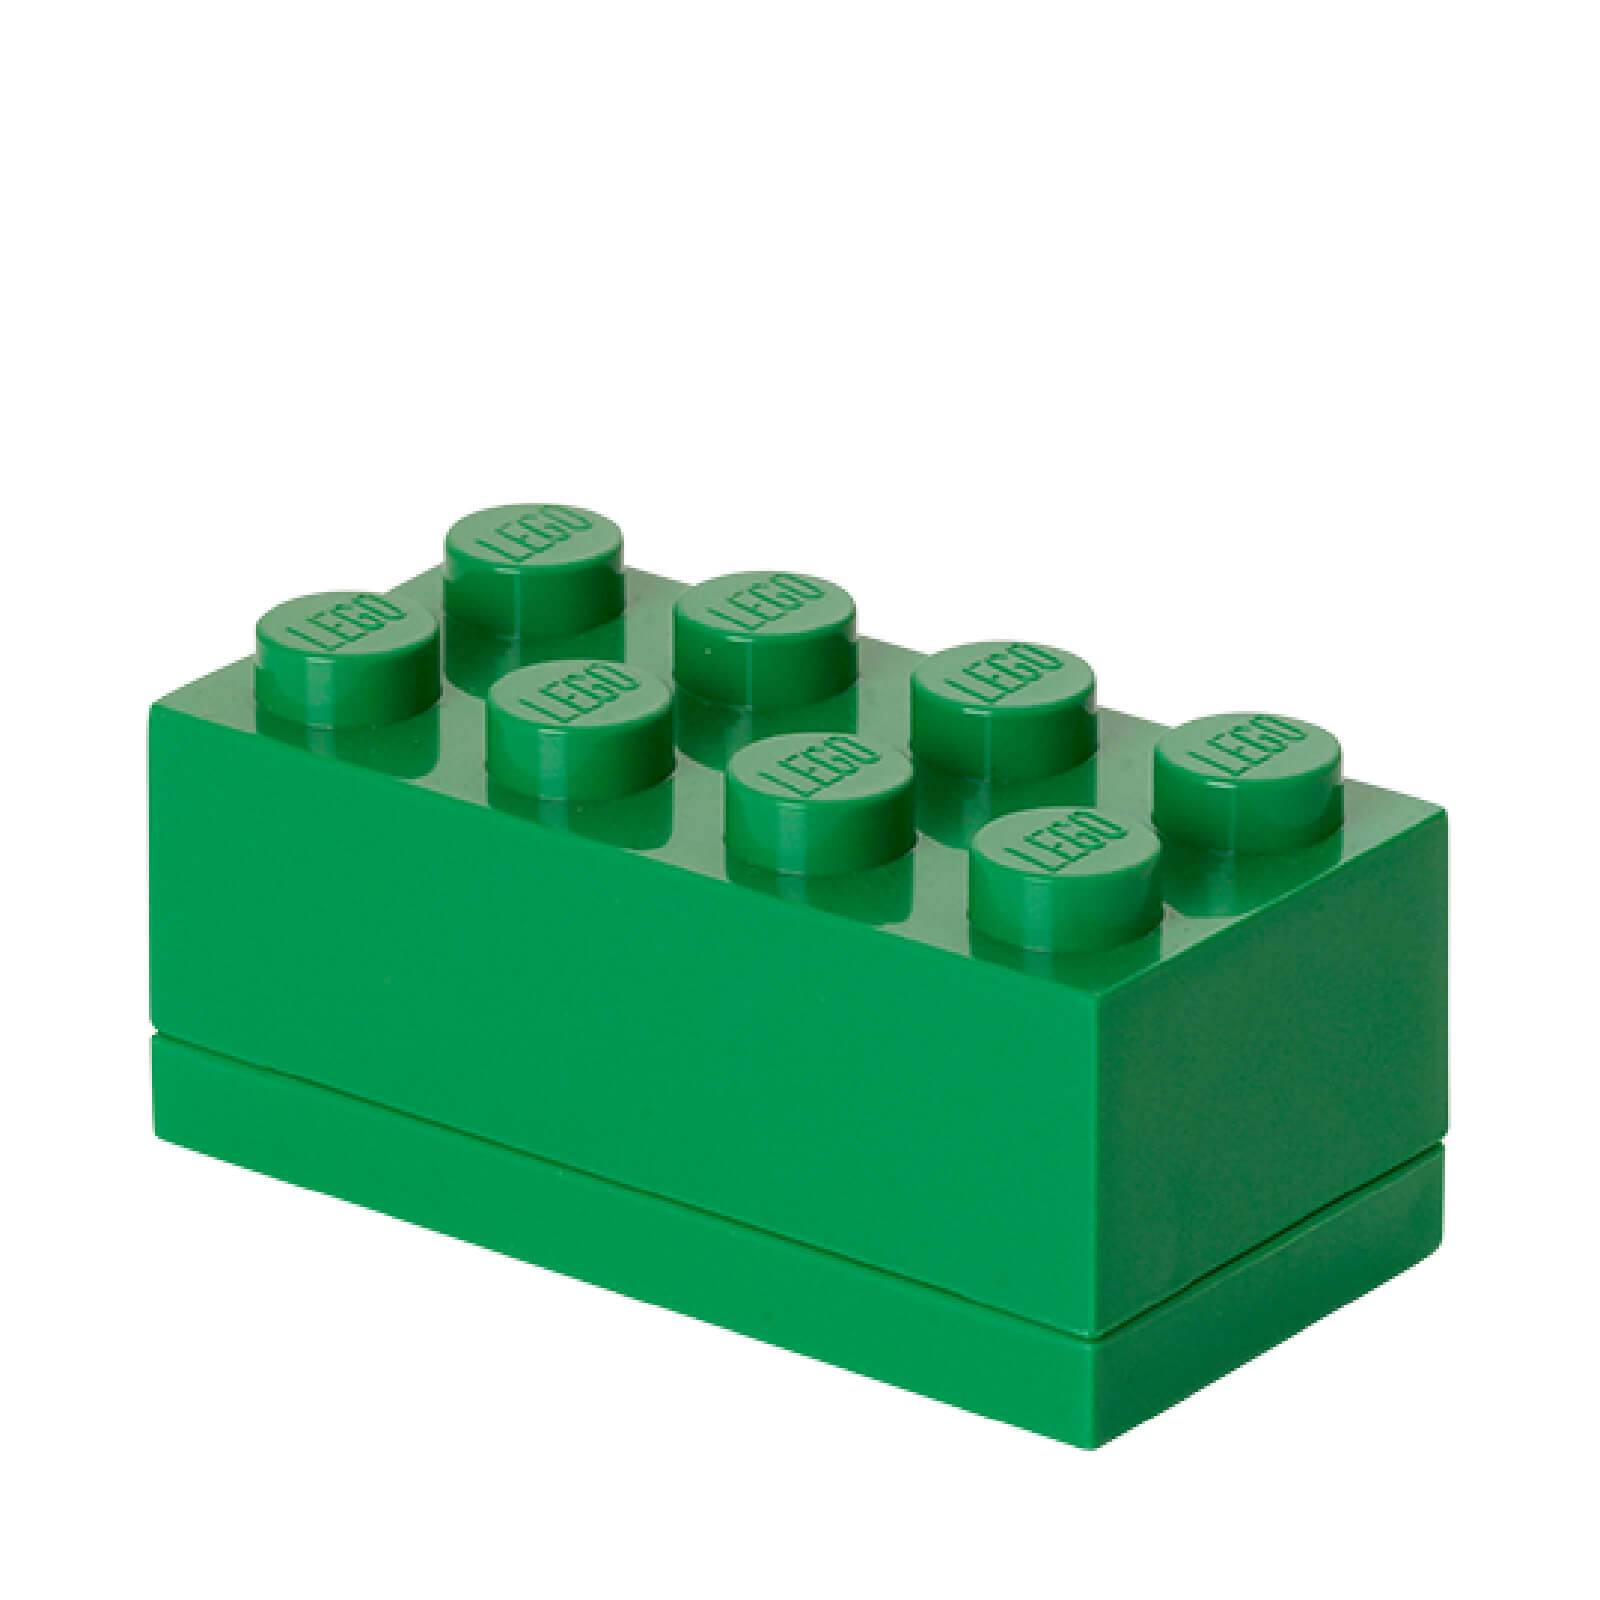 Lego Mini Box 8 - Dark Green